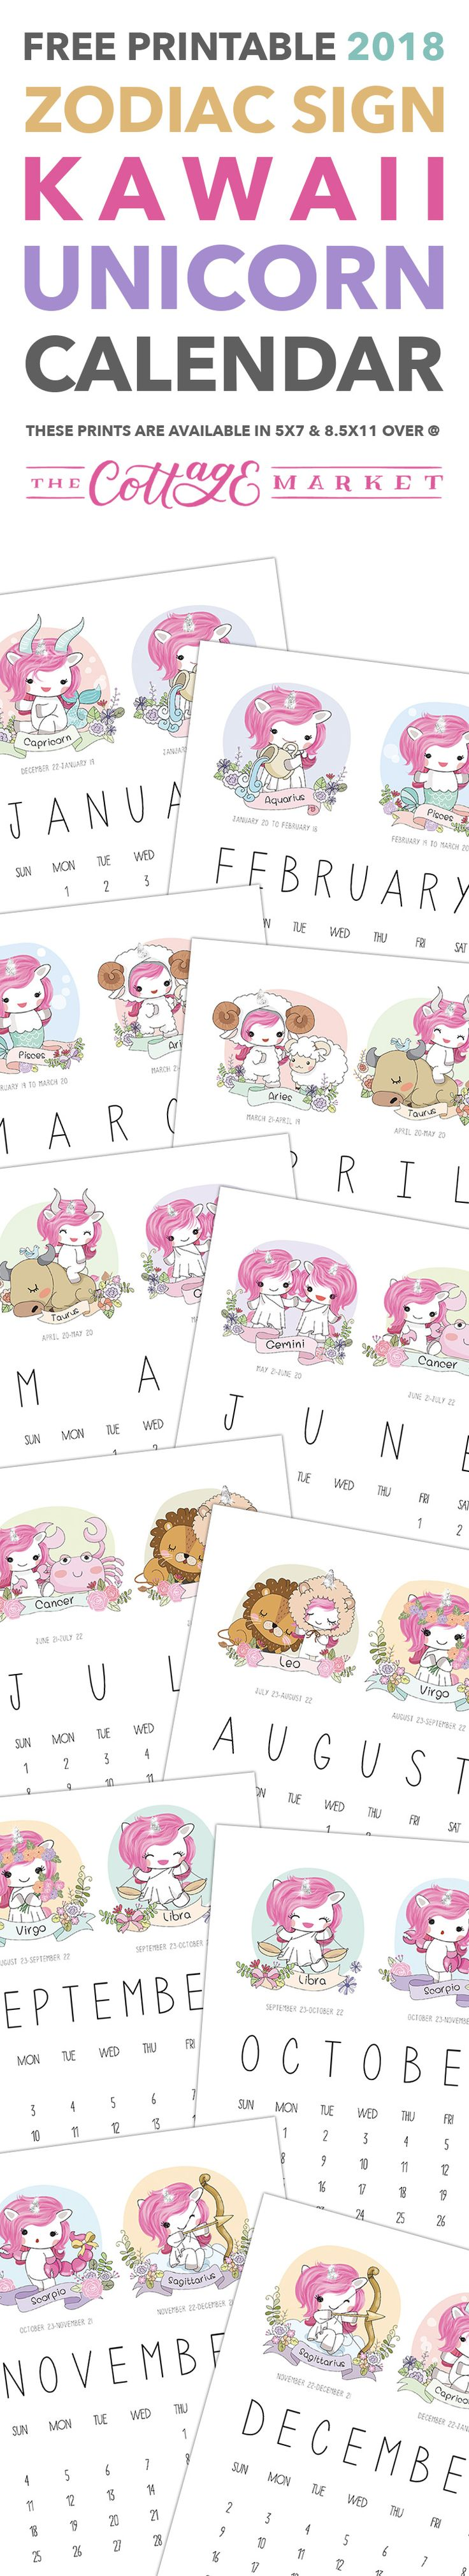 Free Printable 2018 Zodiac Sign Kawaii Unicorn Calendar